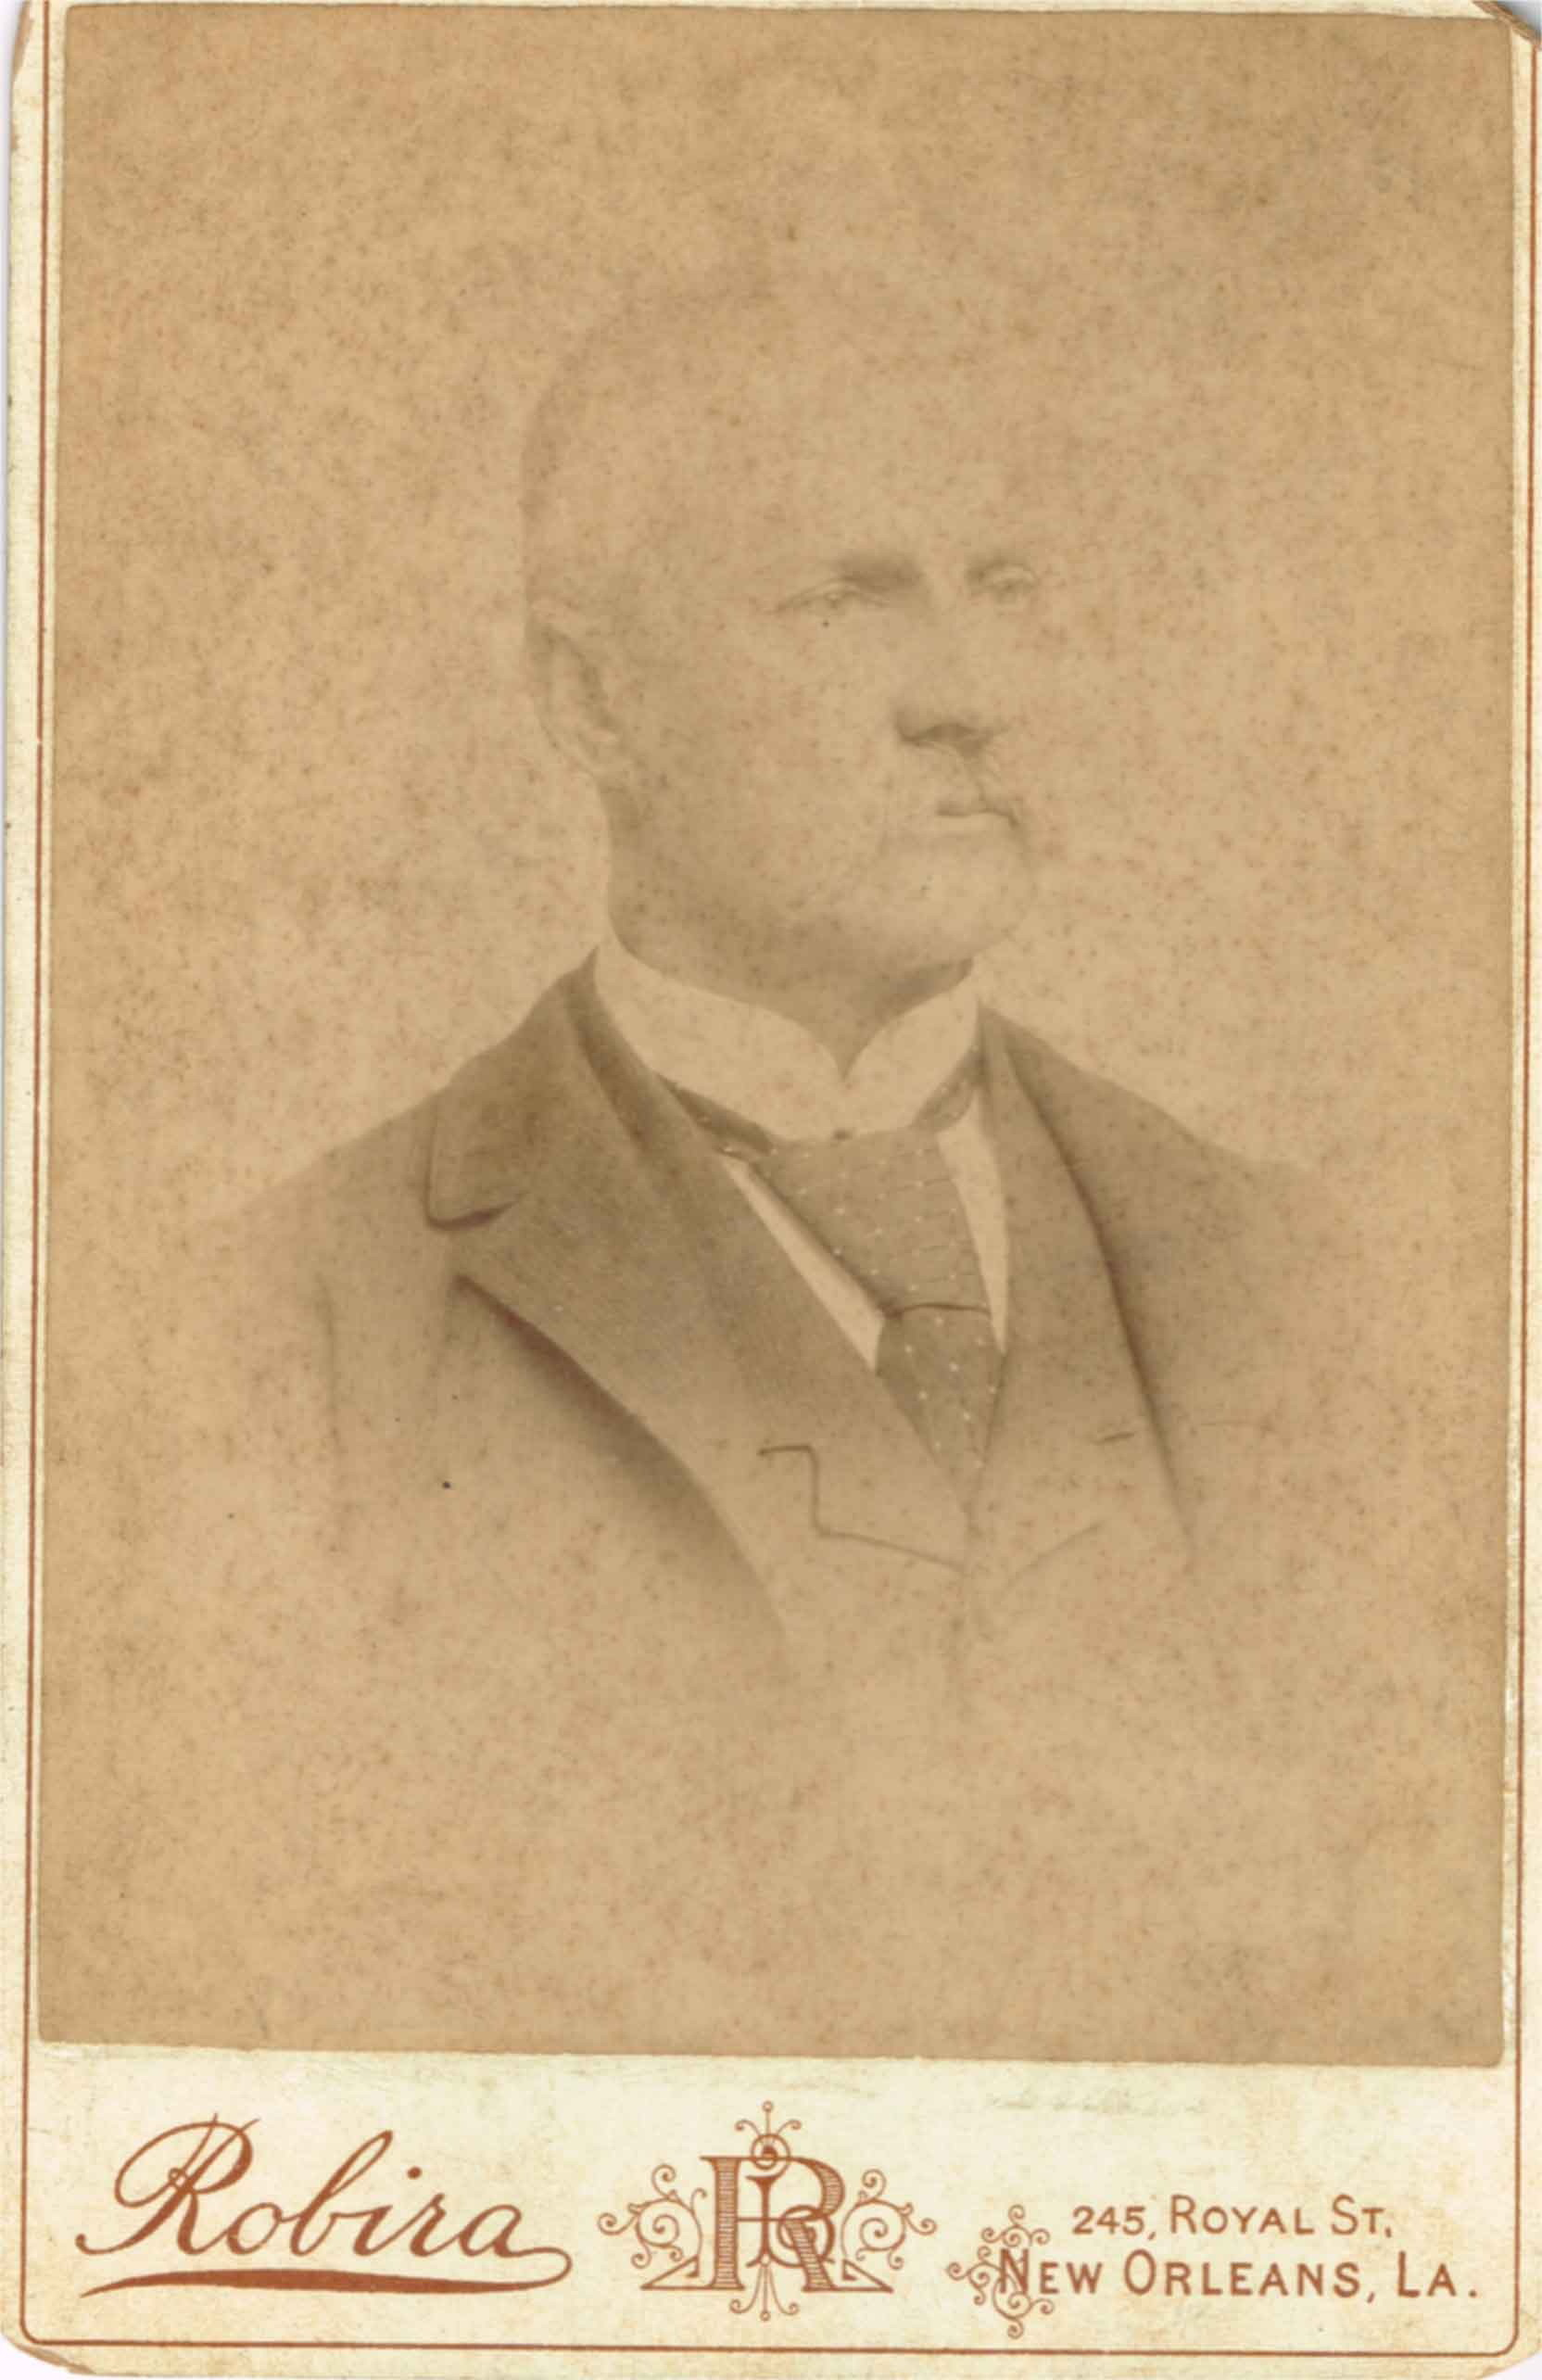 Hormidas Lefebvre